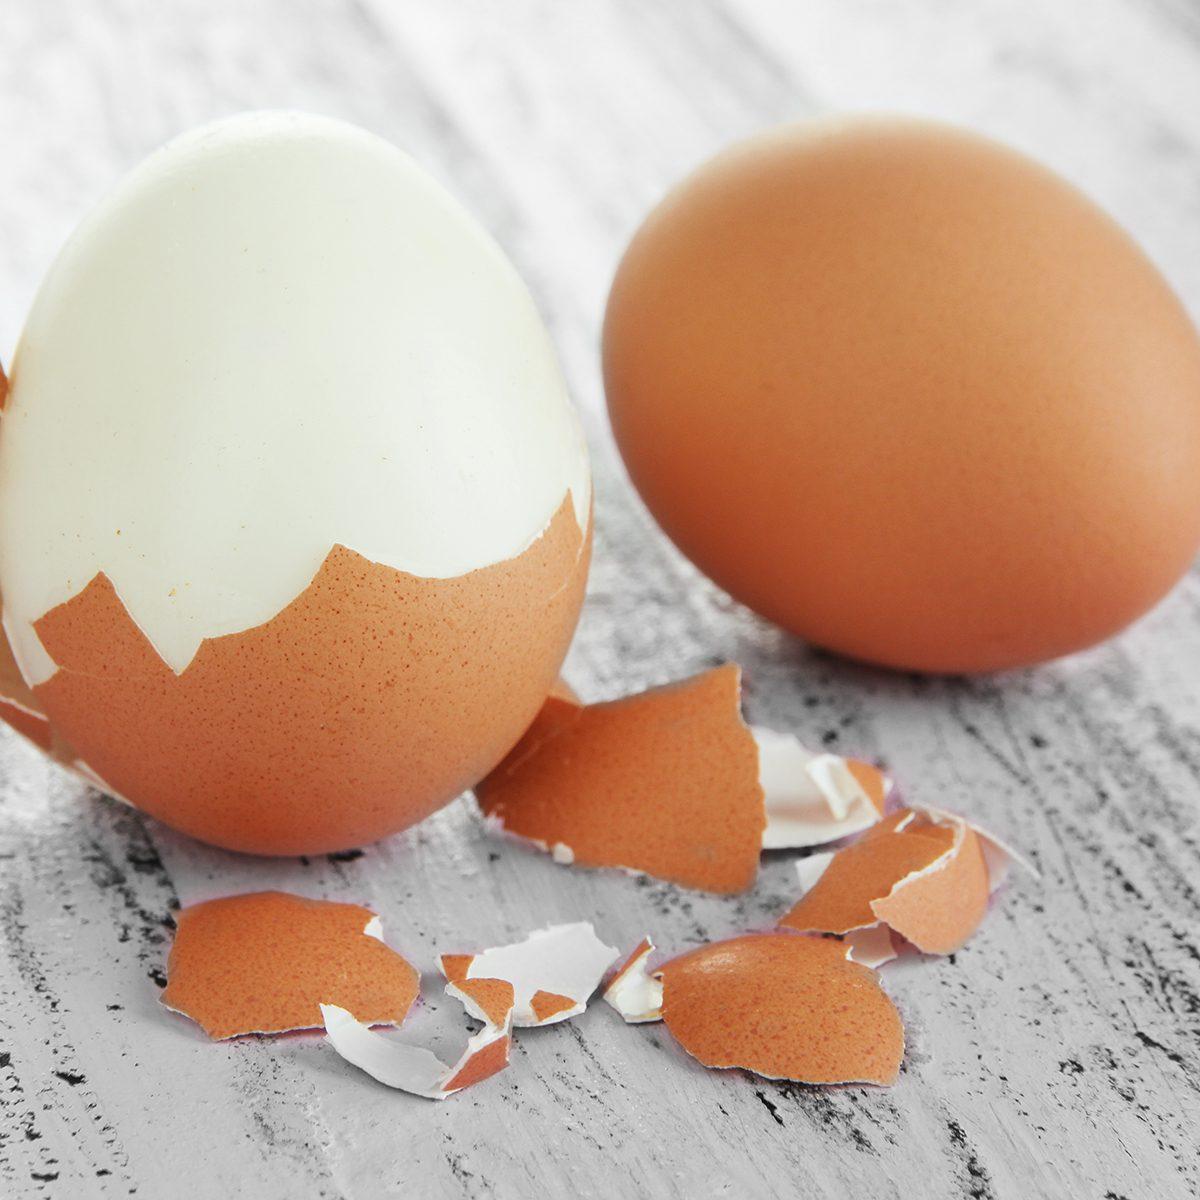 Peeled boiled egg on wooden background